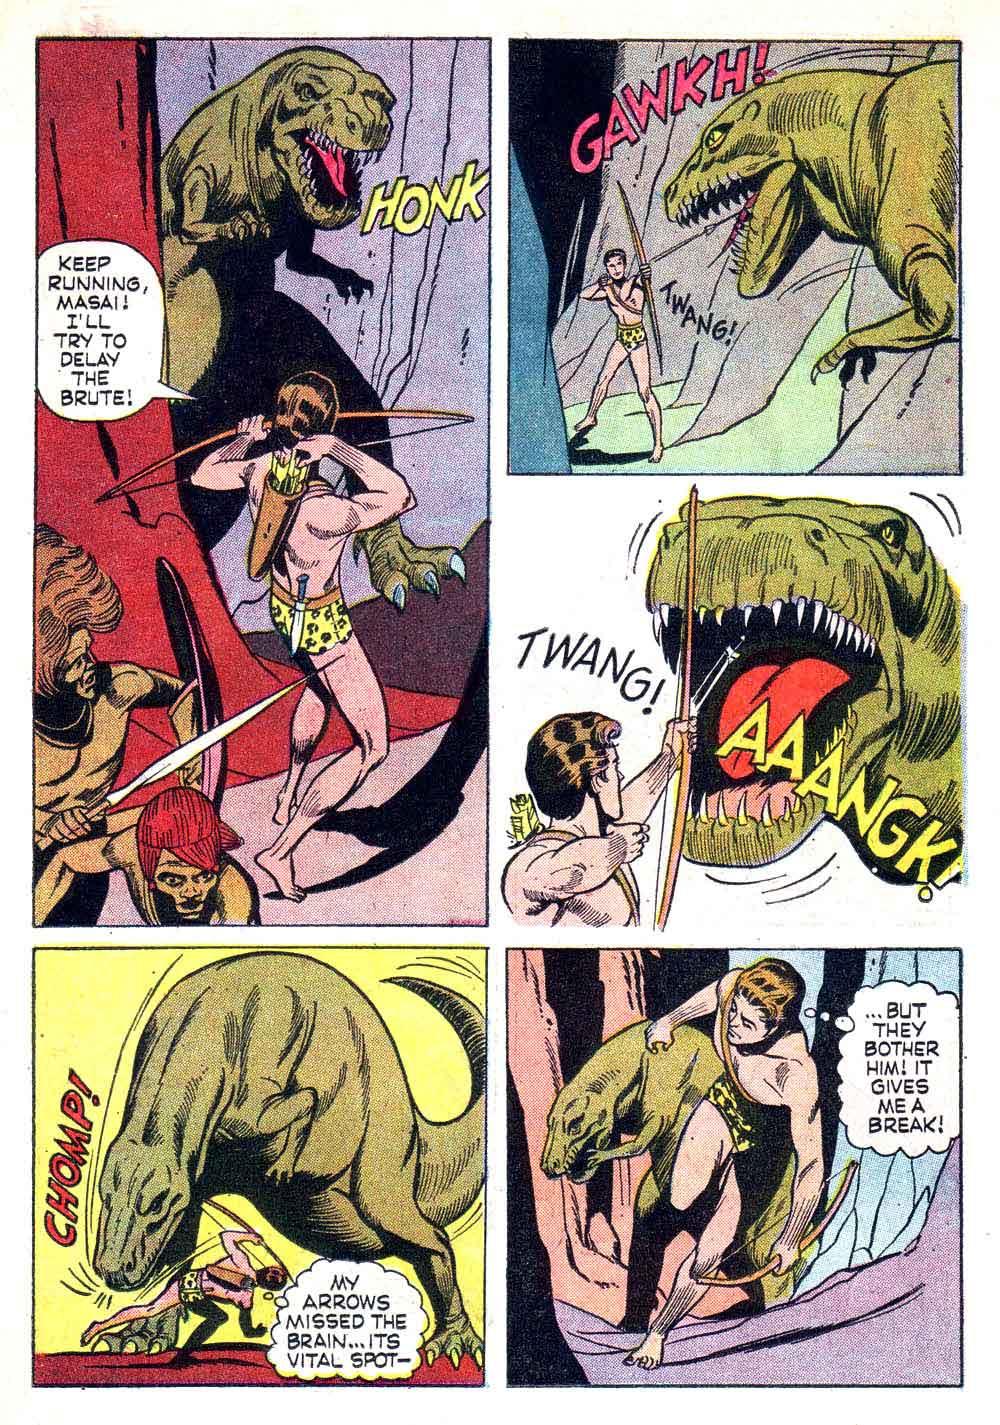 Korak Son of Tarzan v1 #11 gold key silver age 1960s comic book page art by Russ Manning